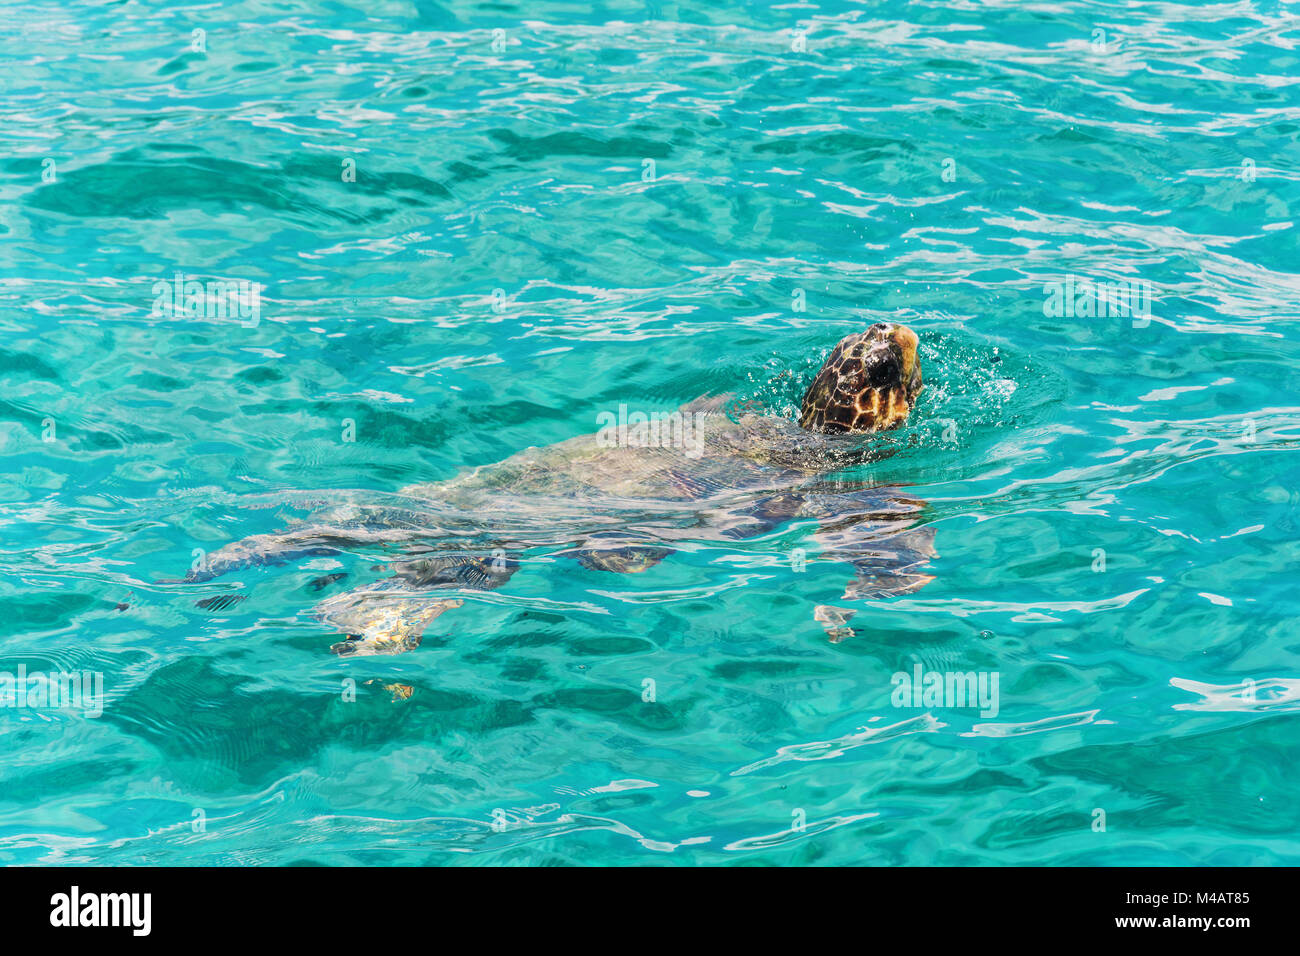 Caretta-Caretta turtle rose to the surface to breathe air - Stock Image